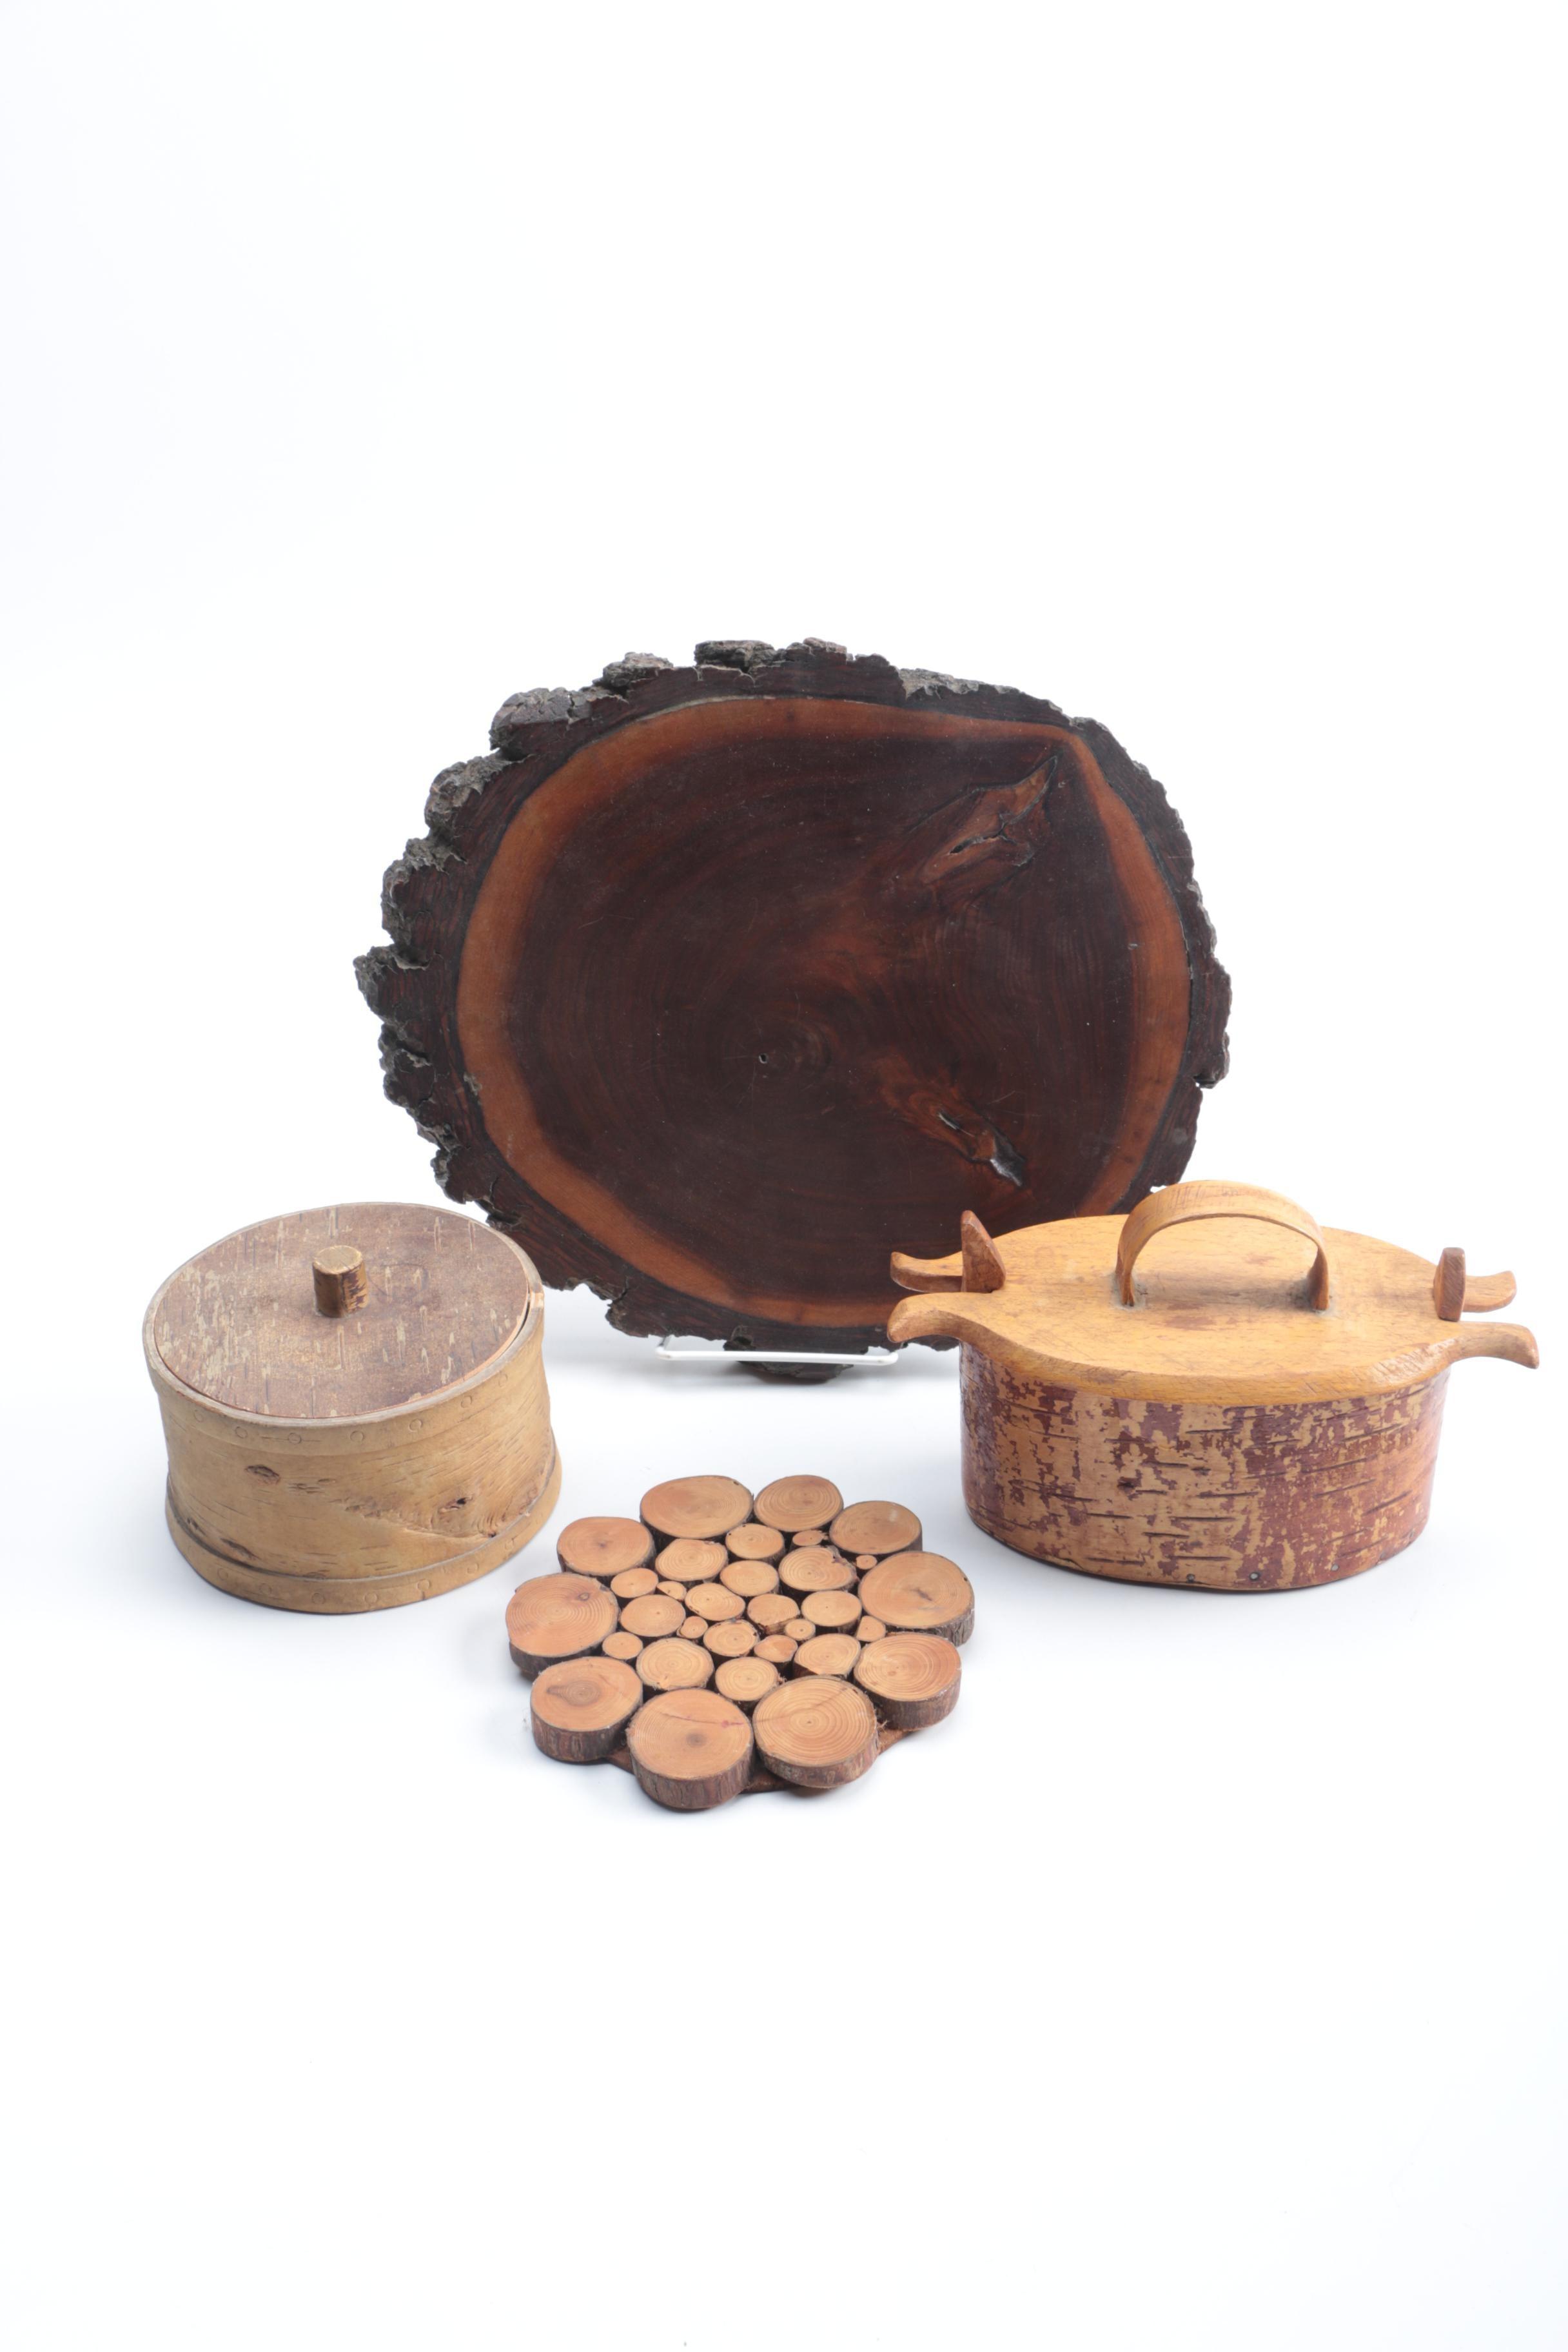 Assortment of Wooden Home Decor